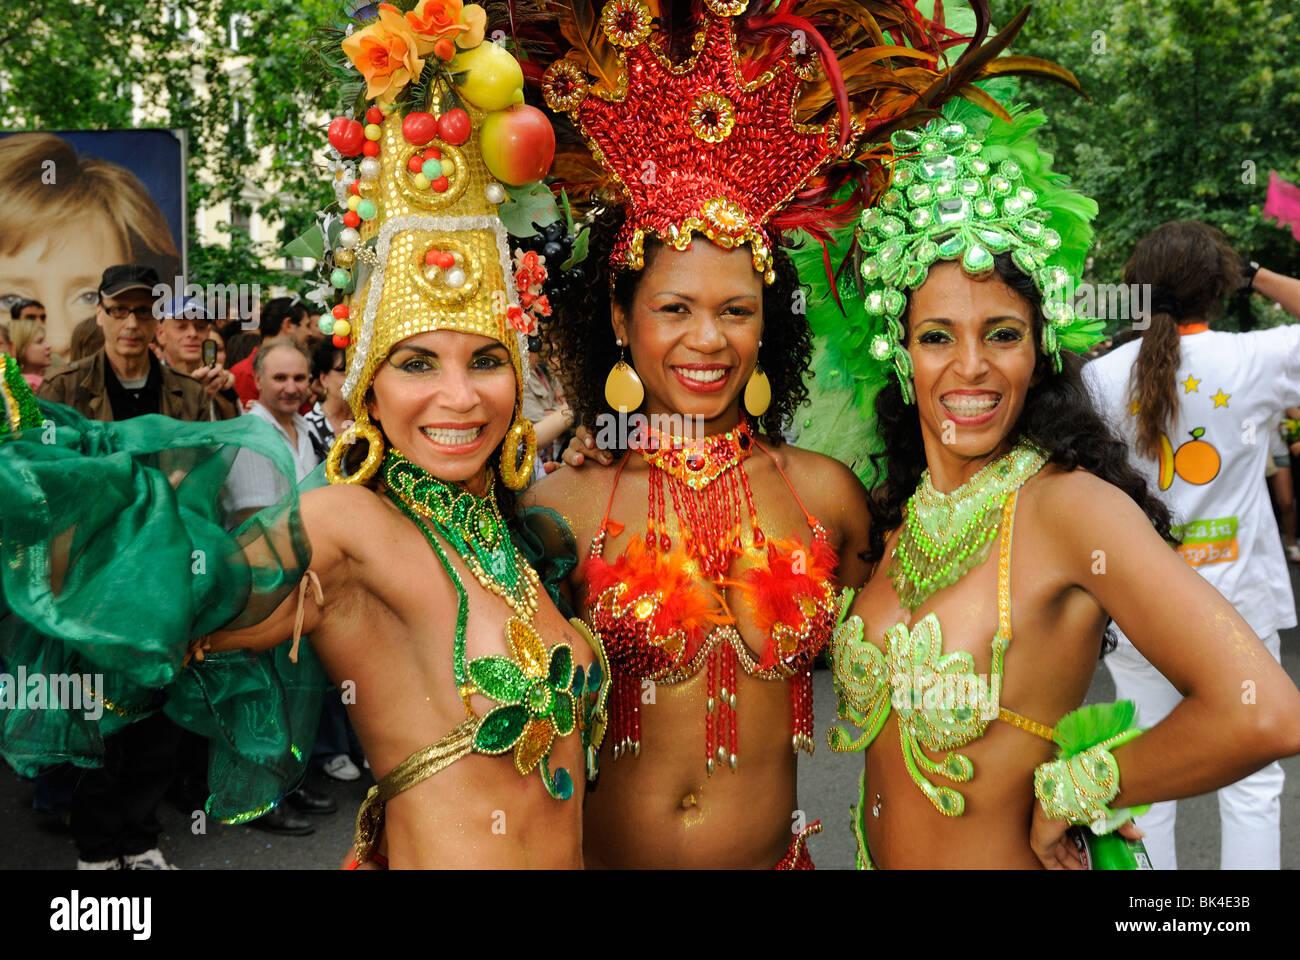 Drei brasilianischen Samba-Tänzer am Karneval der Kulturen, Karneval der Kulturen, Kreuzberg Bezirk, Berlin, Stockbild